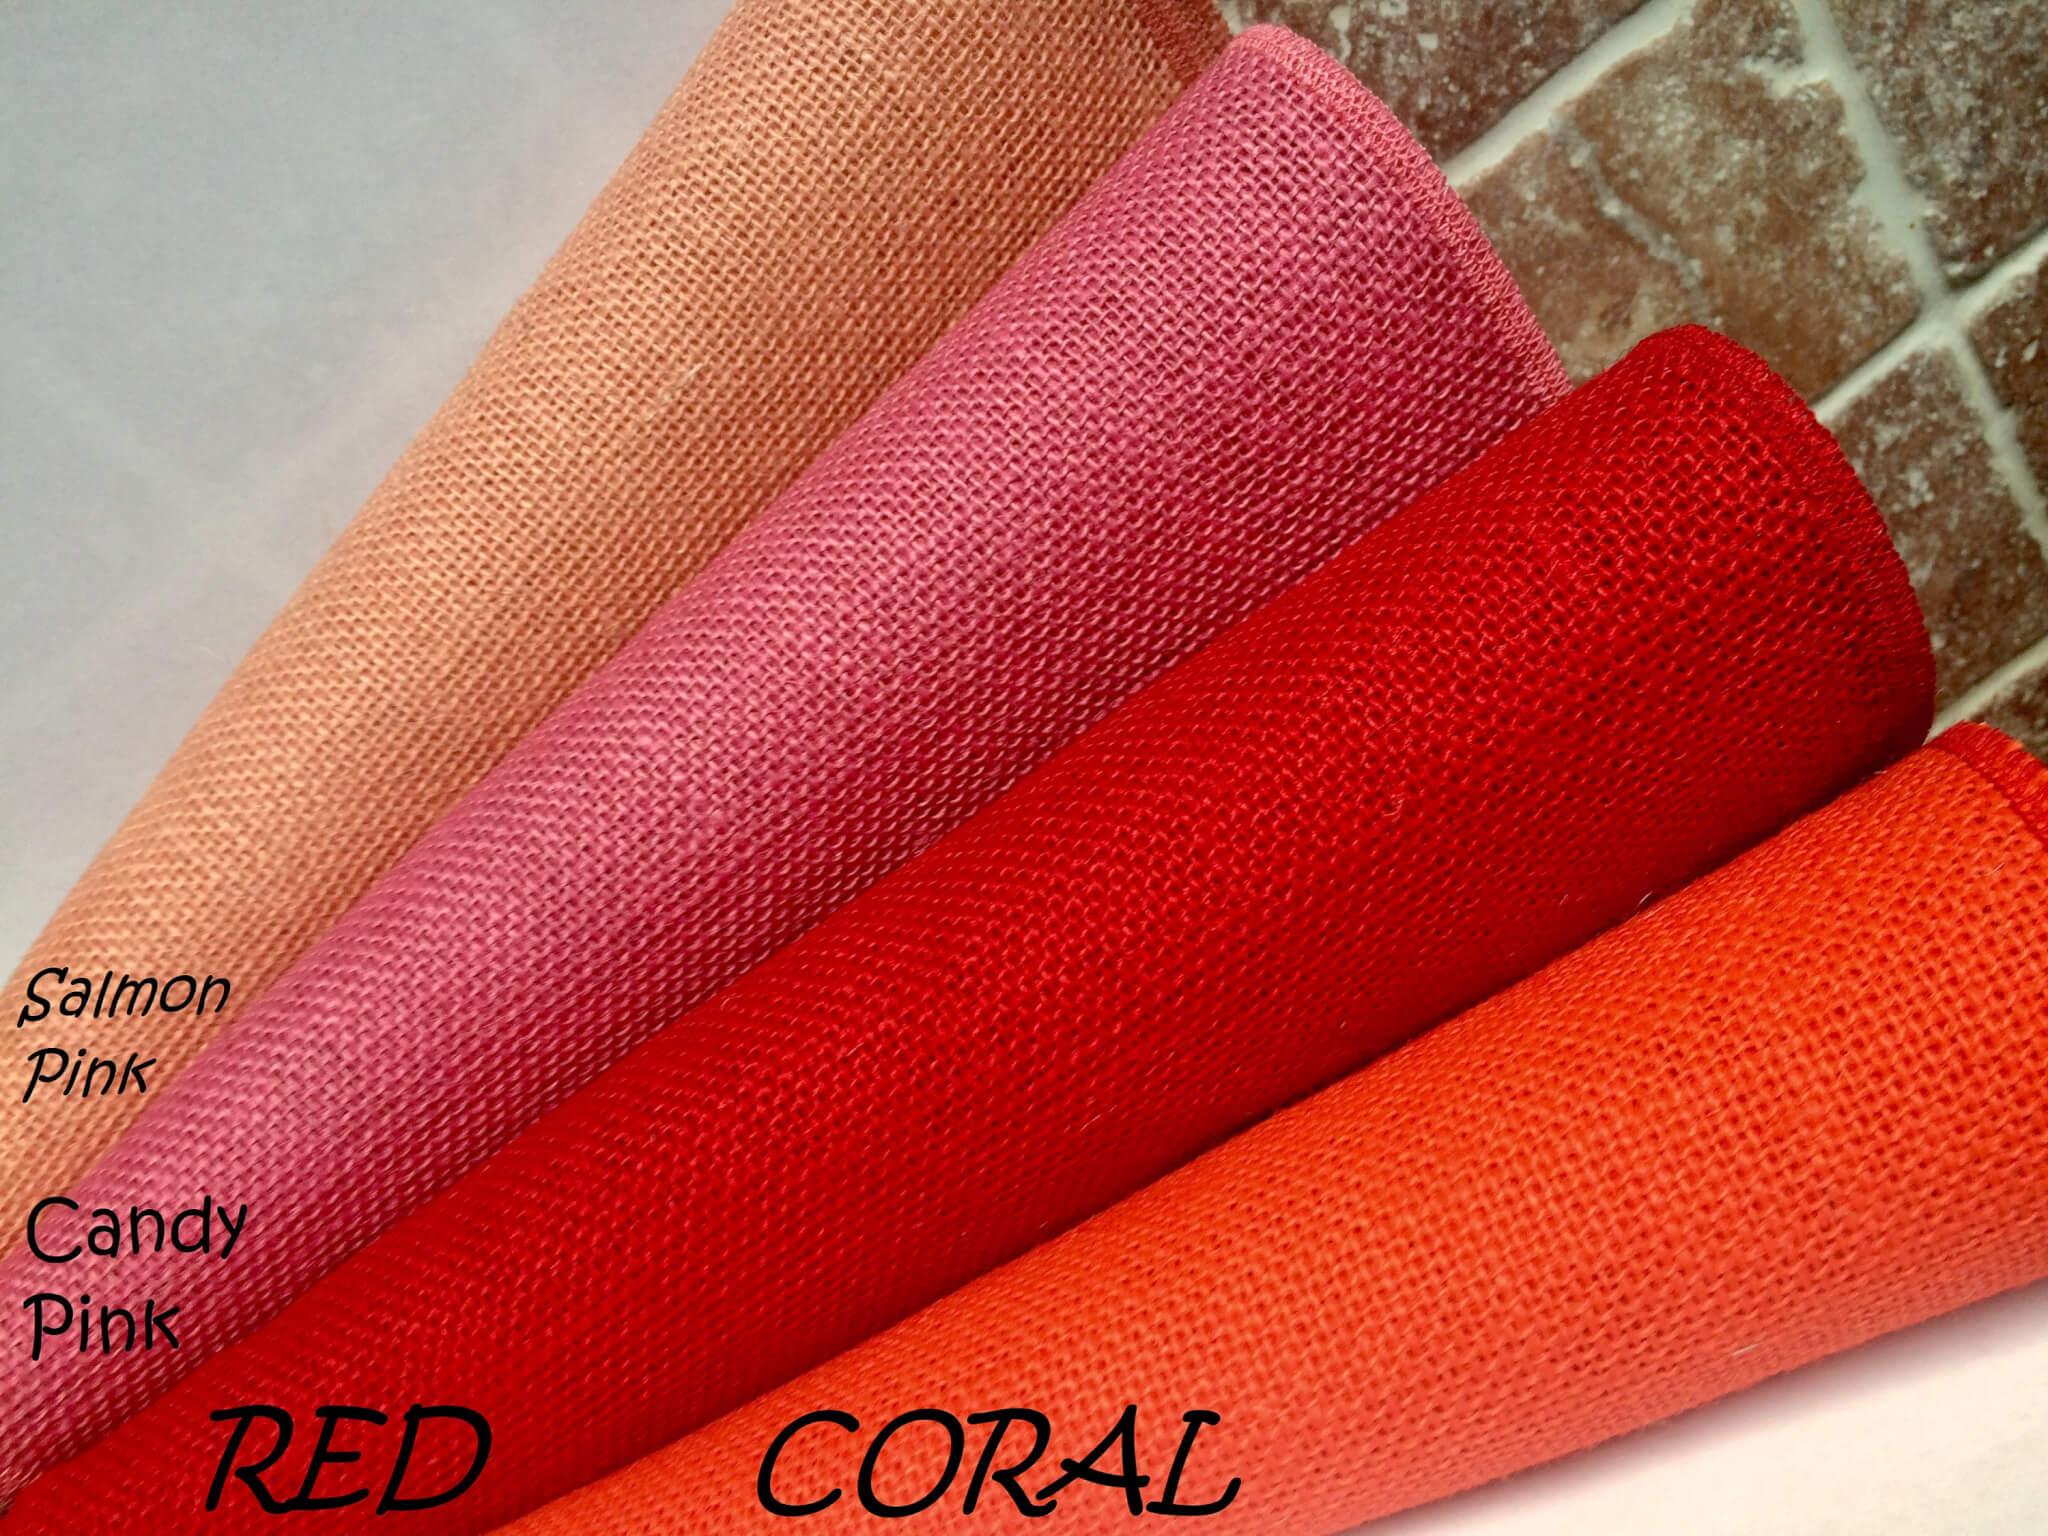 12-wide-rustic-burlap-jute-runners-for-events-weddings-home-jute-hessian-table-runner-salmon-pink-pink-red-coral-burgundy-jute-5aee184e1.jpg